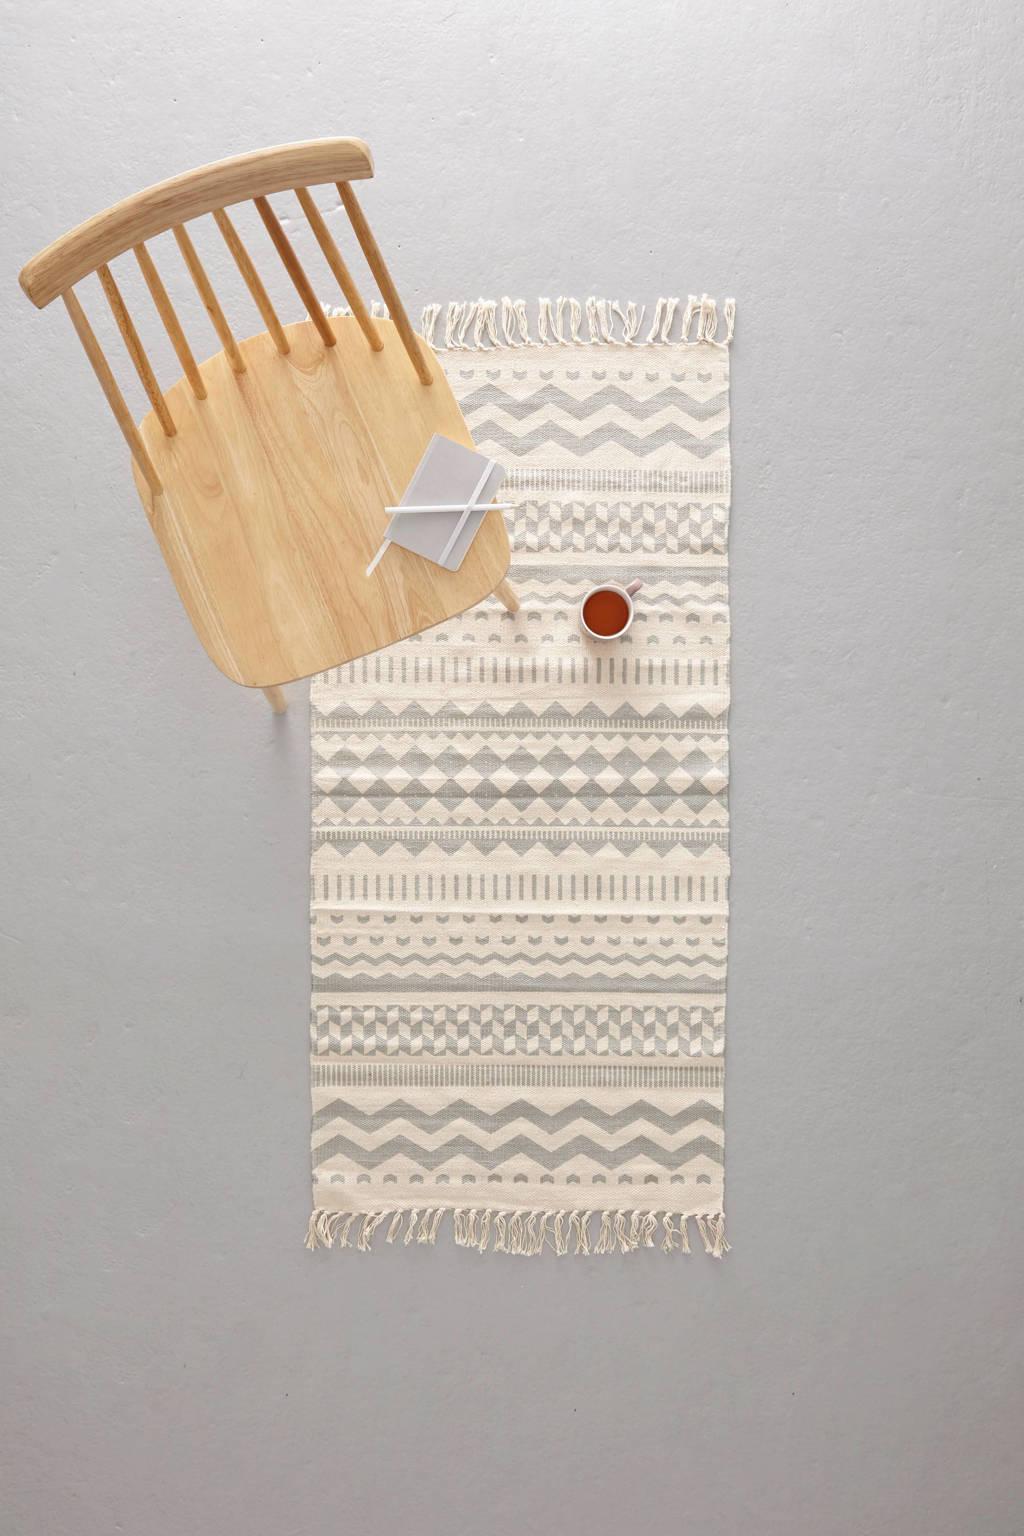 whkmp's own vloerkleed   (120x60 cm), grijs/off white